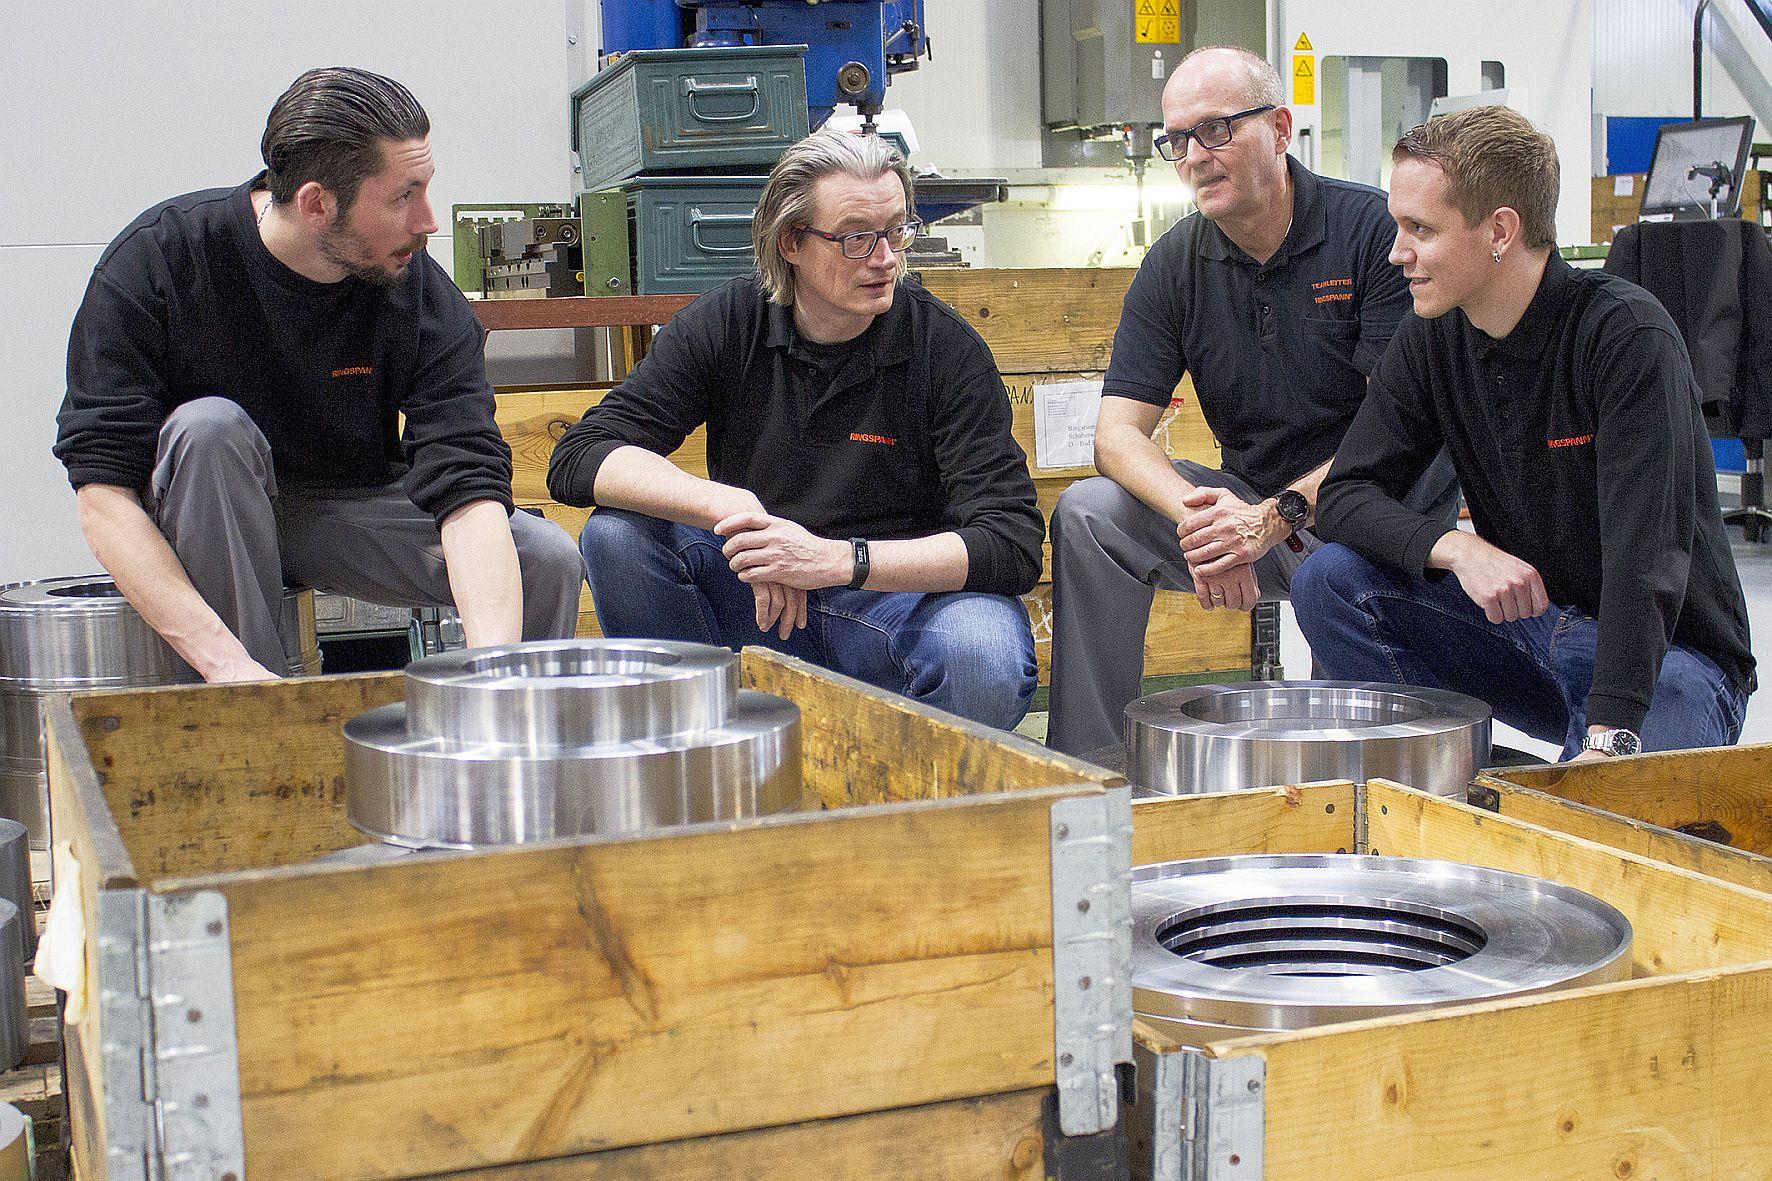 RINGSPANN freewheeling experts